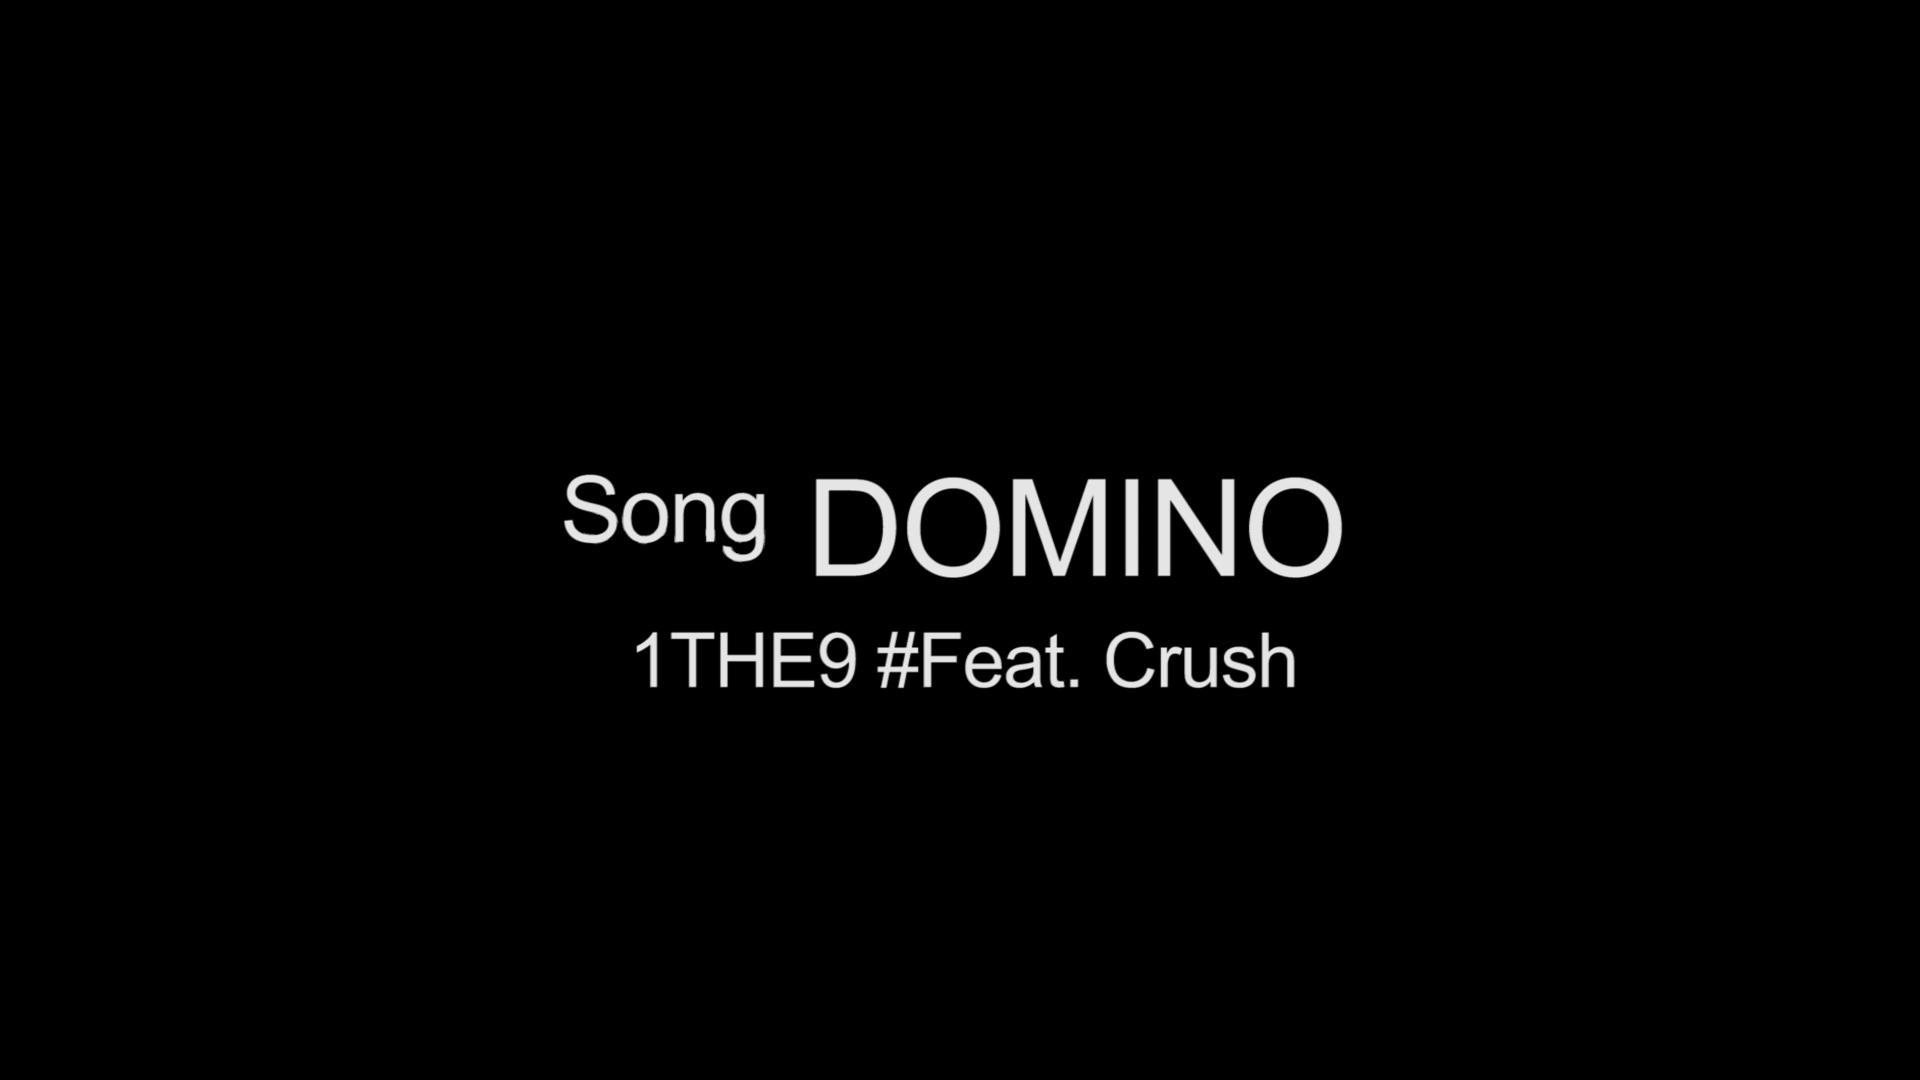 [1THE9]원더나인 - Domino (Feat. Crush) (Prod. Crush, Gxxd)